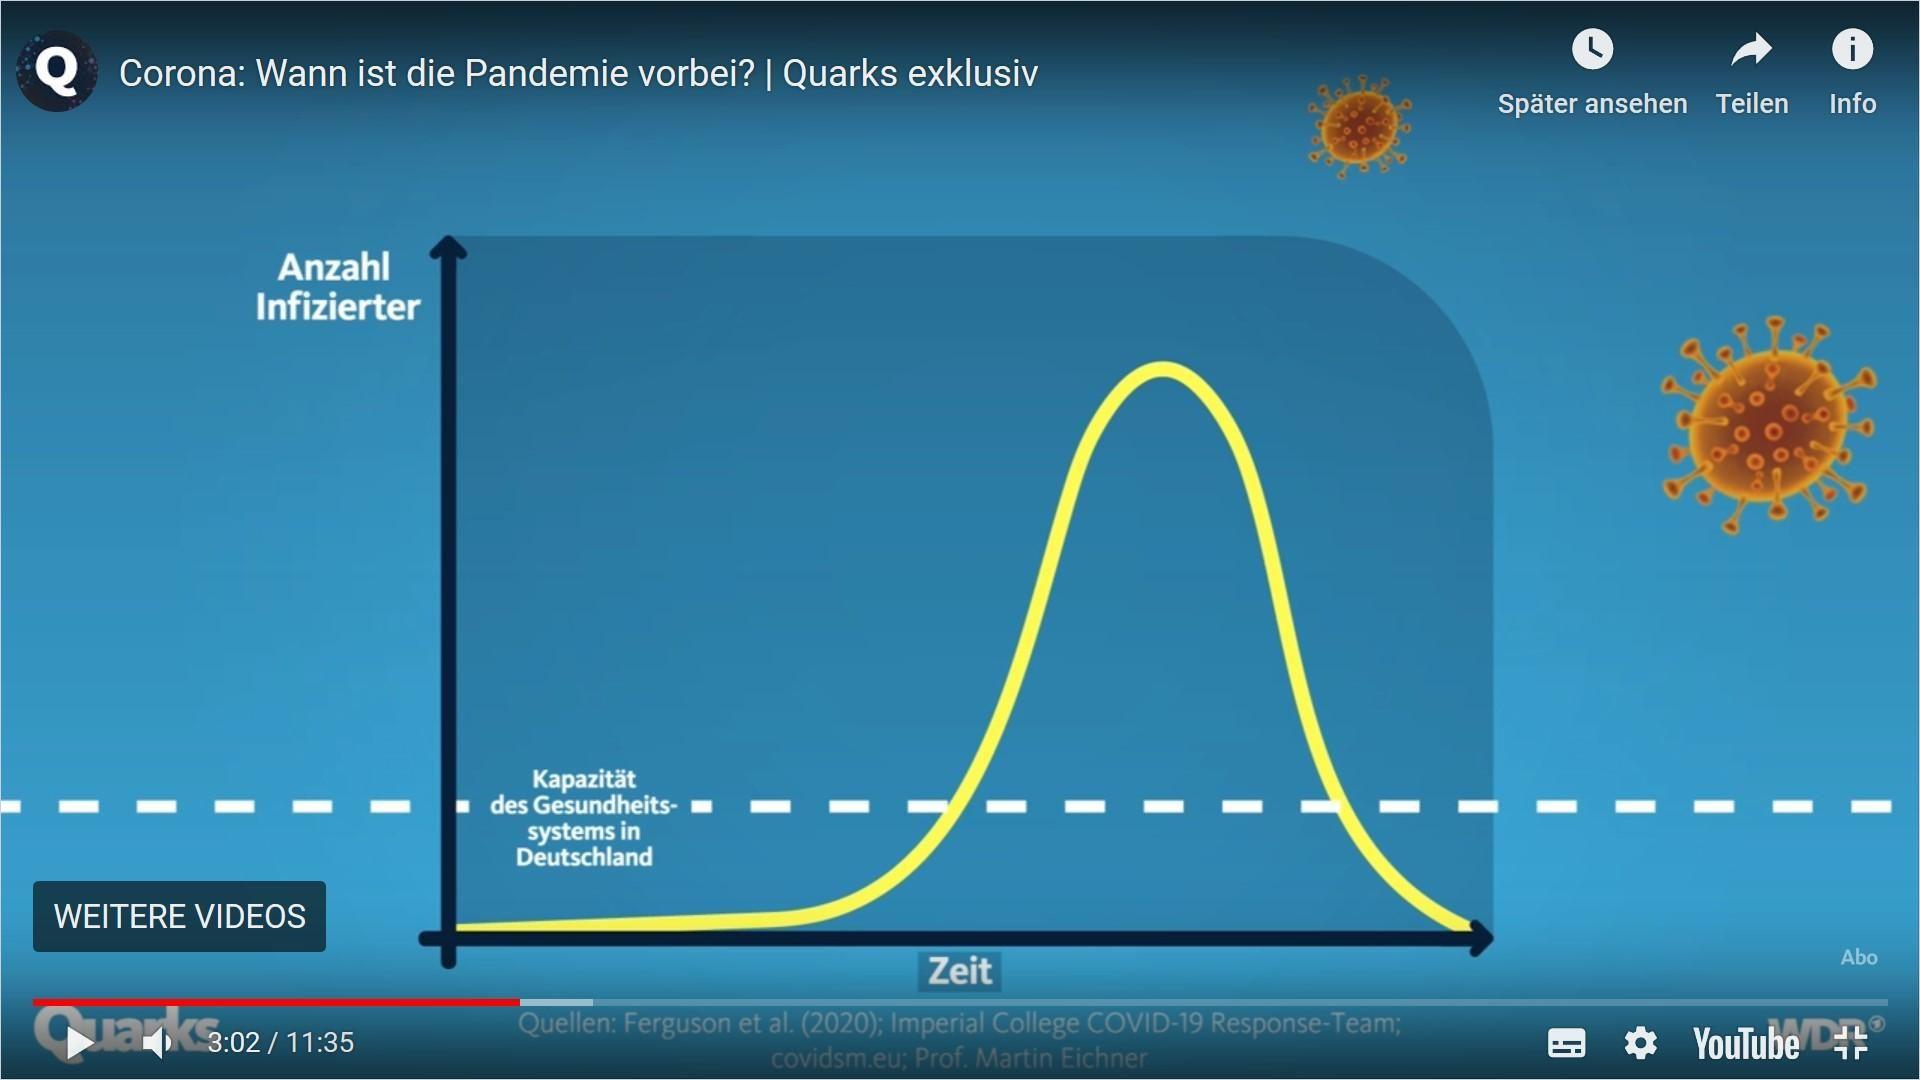 Image of: Wann ist die Pandemie vorbei?